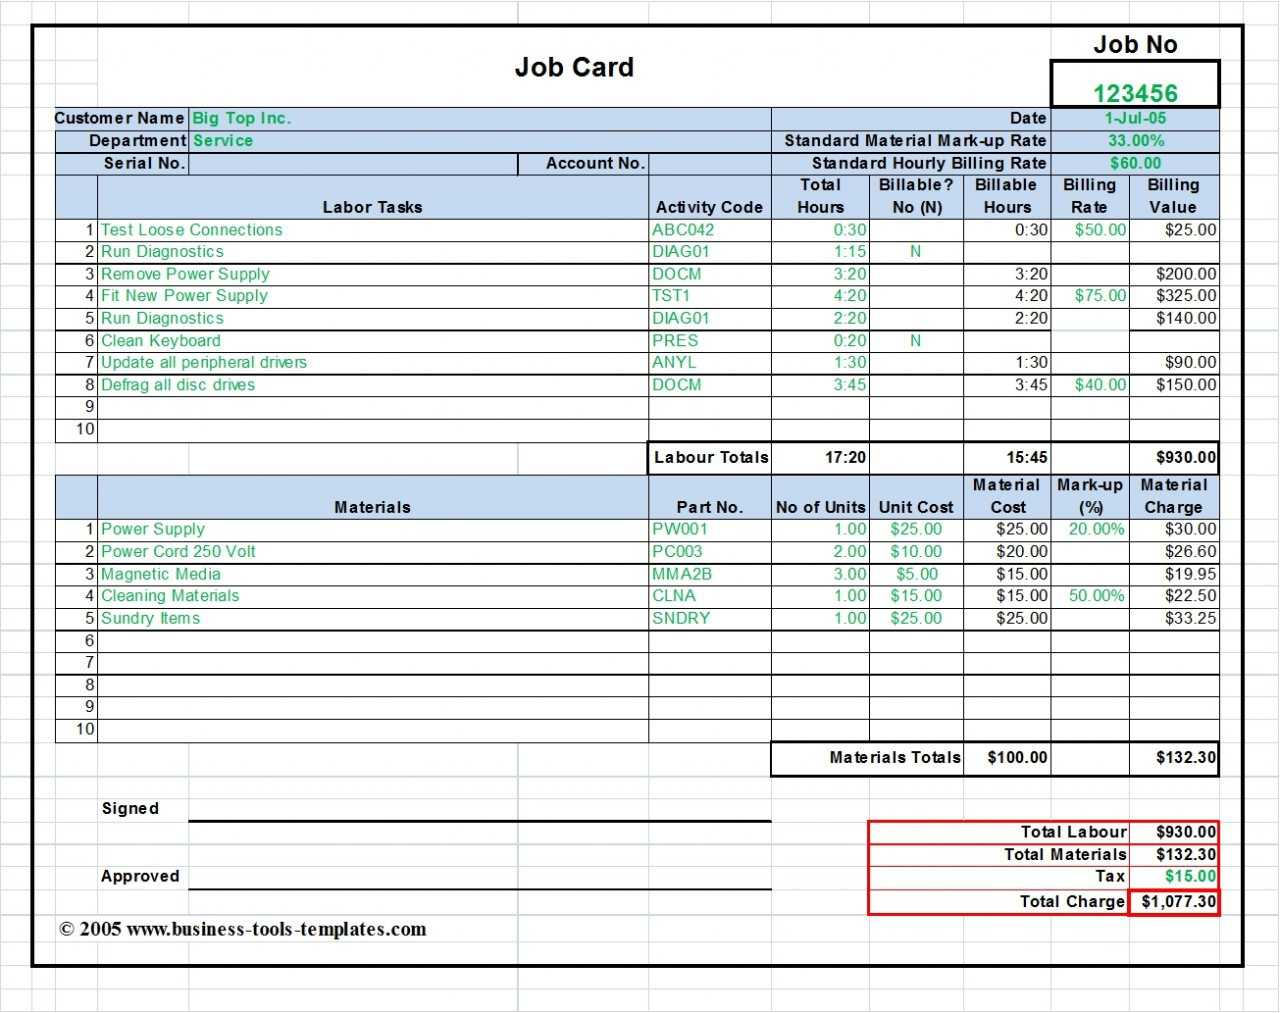 Maintenance Repair Job Card Template - Microsoft Excel Throughout Service Job Card Template